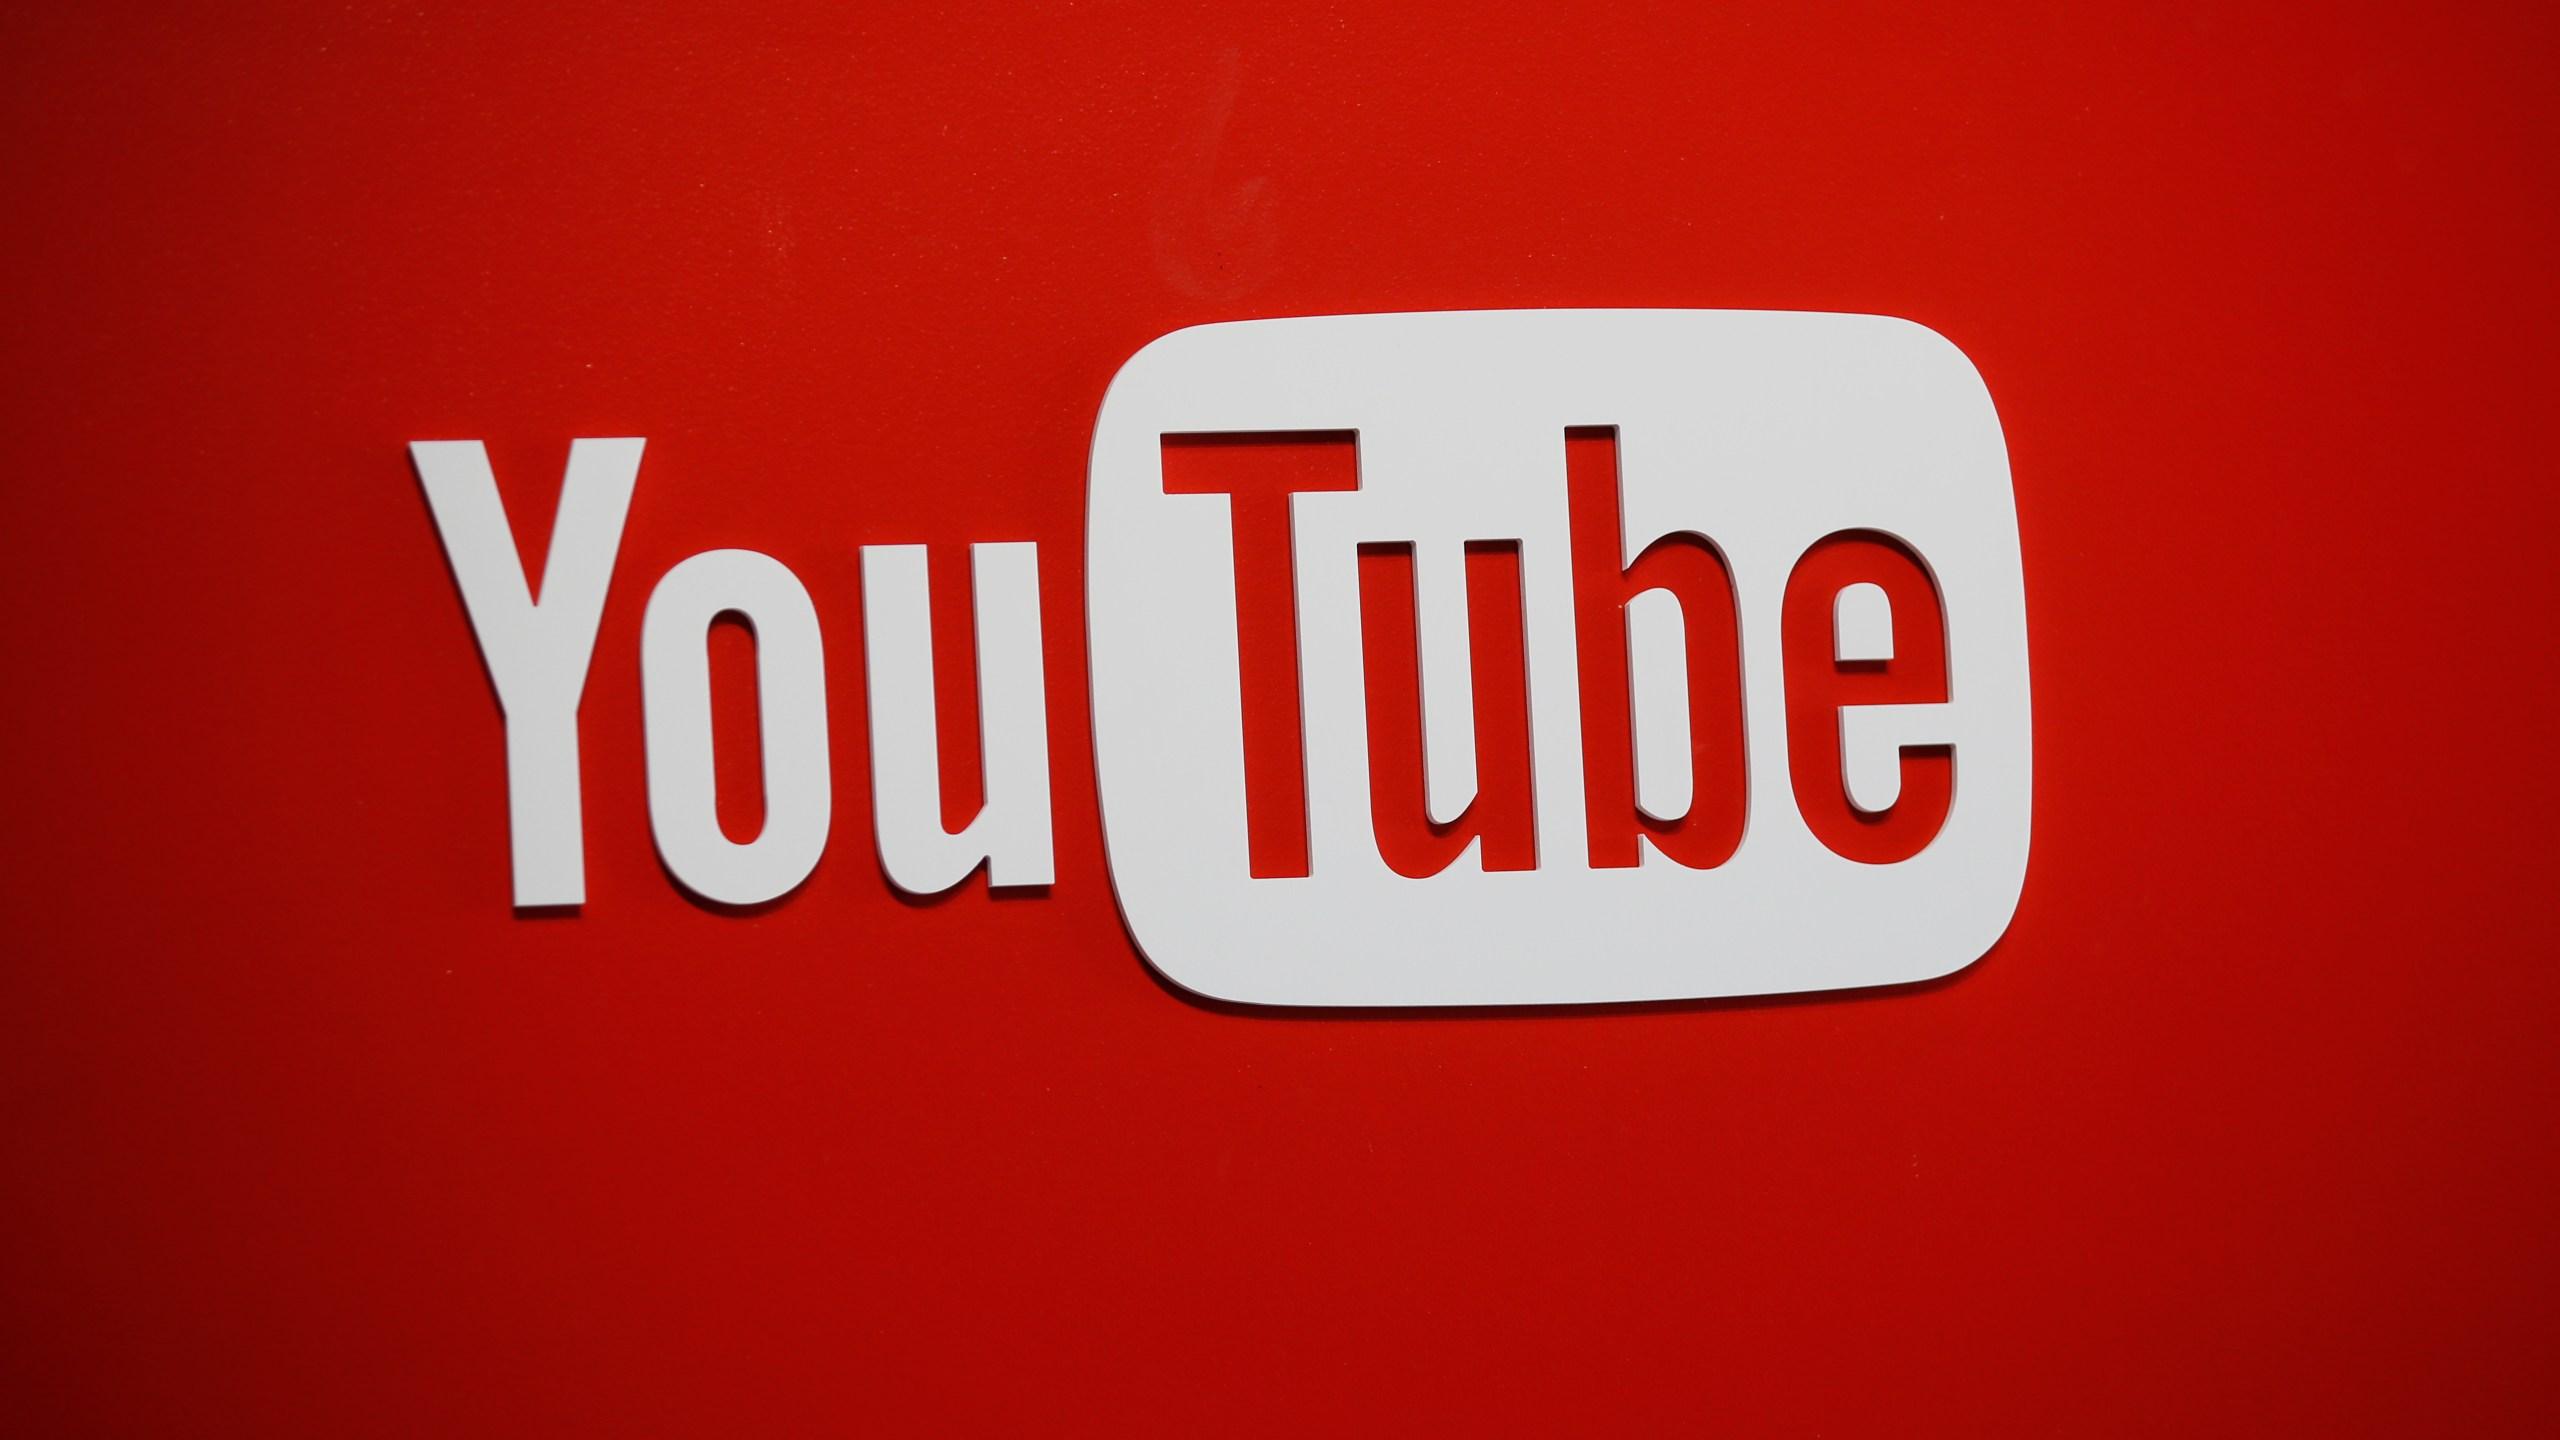 YouTube_1521736189008